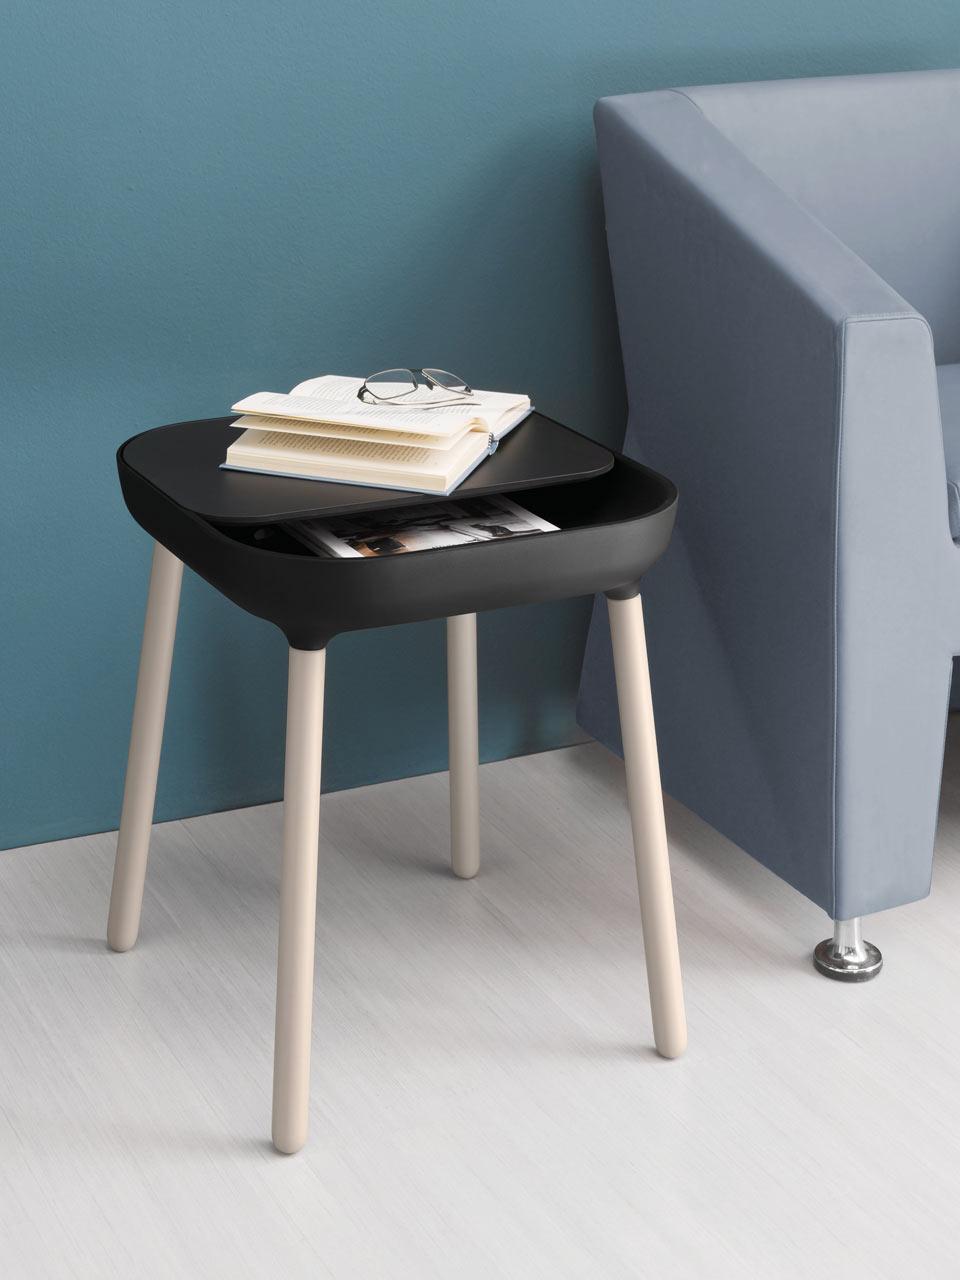 App-Side-Table-hisheji (2)